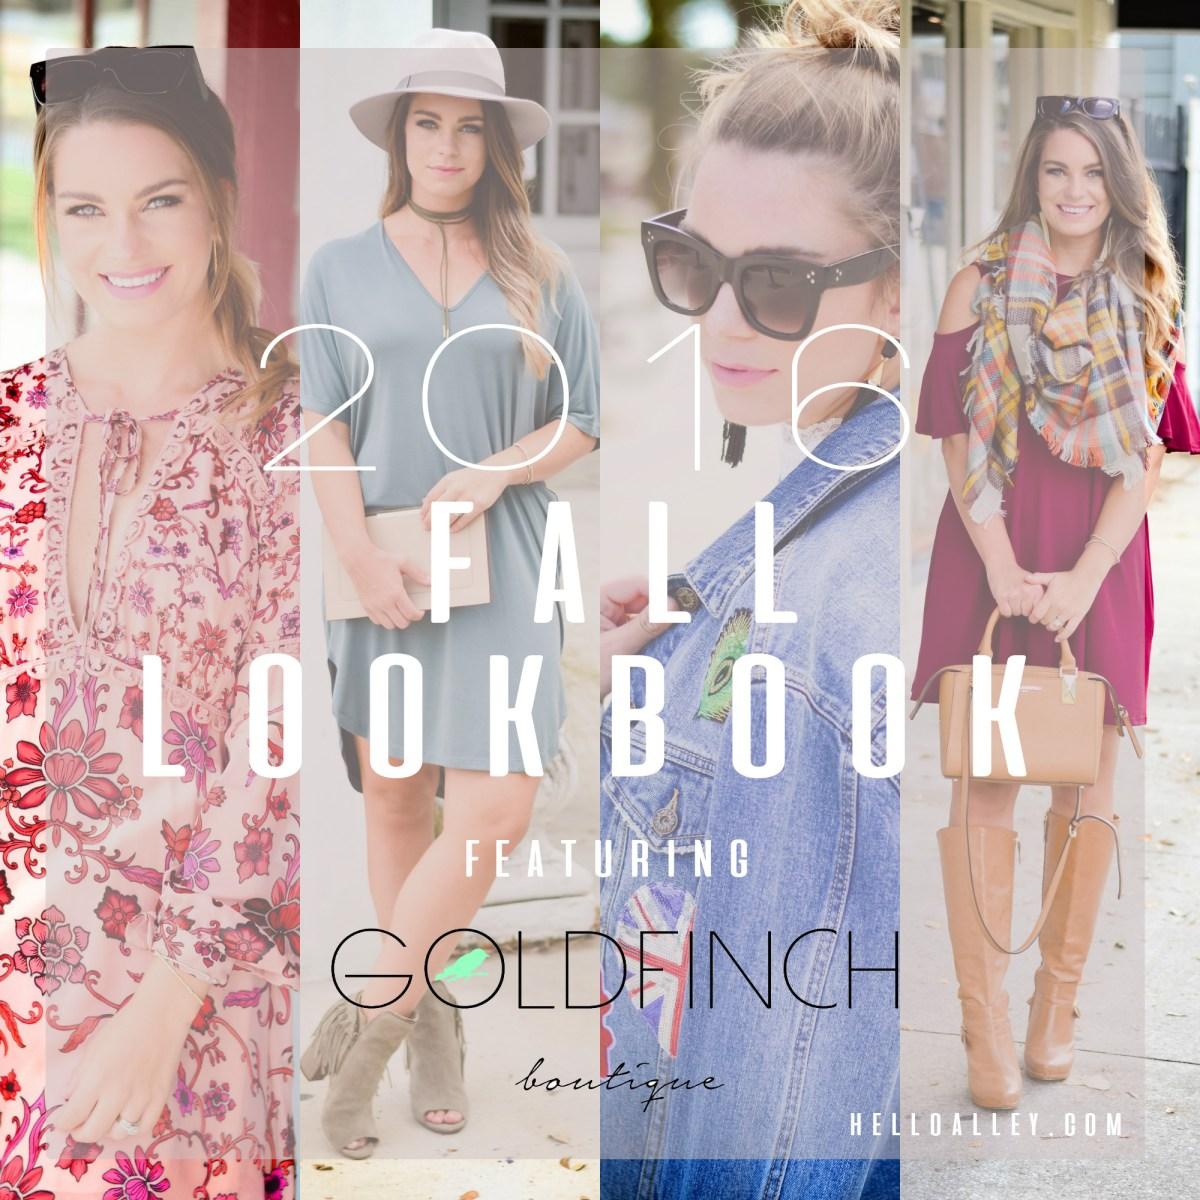 goldfinch-boutique-fall-lookbook-copy